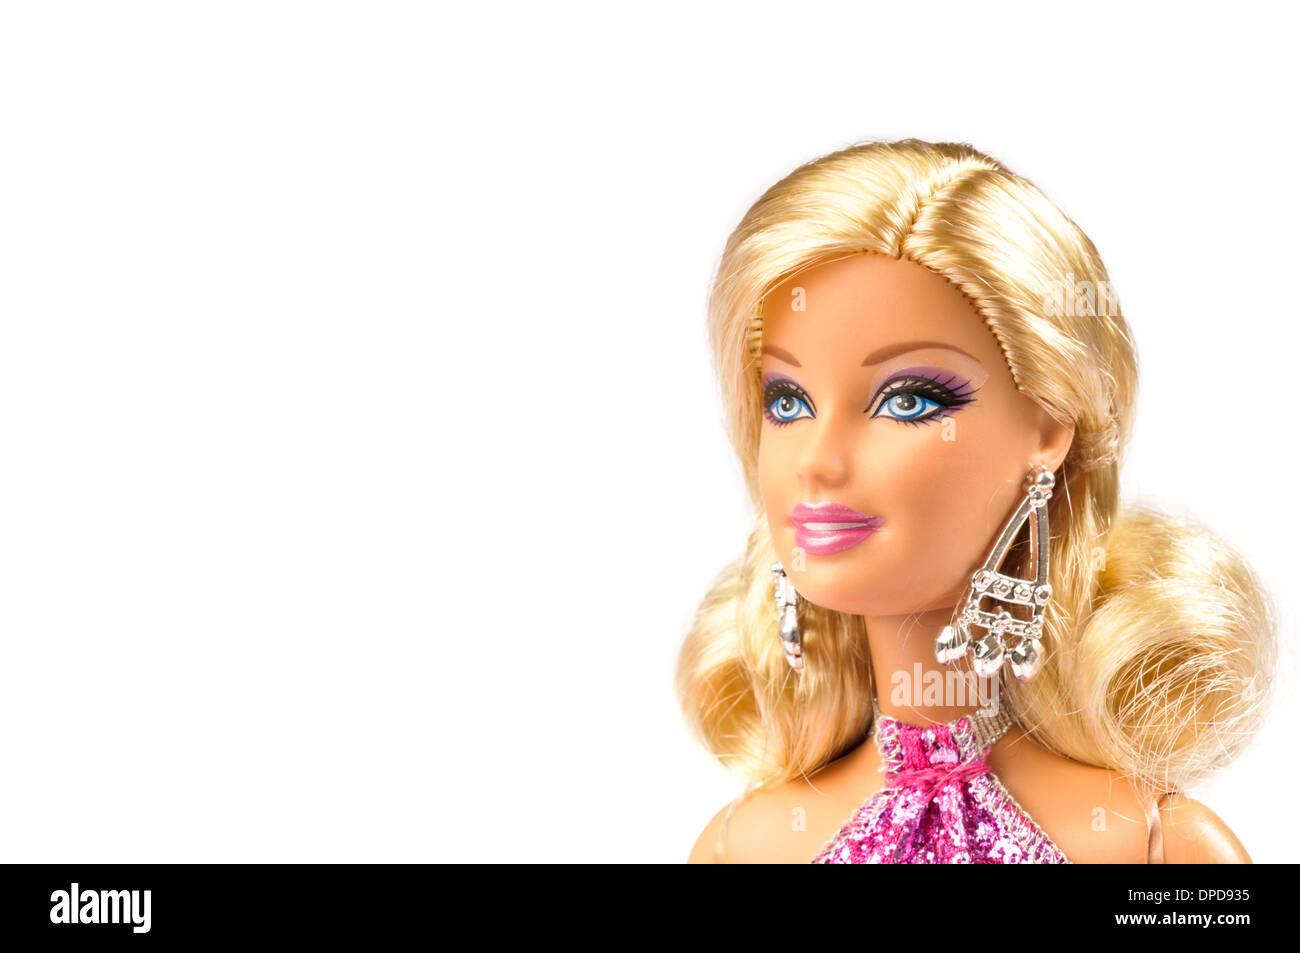 Barbie doll - Stock Image